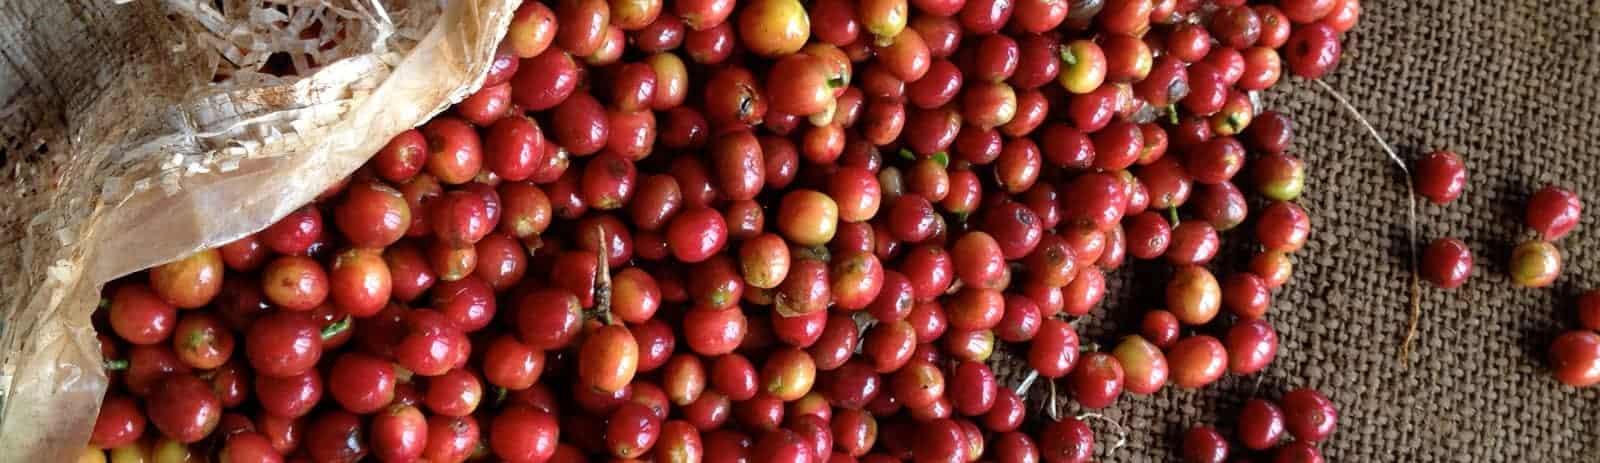 Coffee Bean Cherries